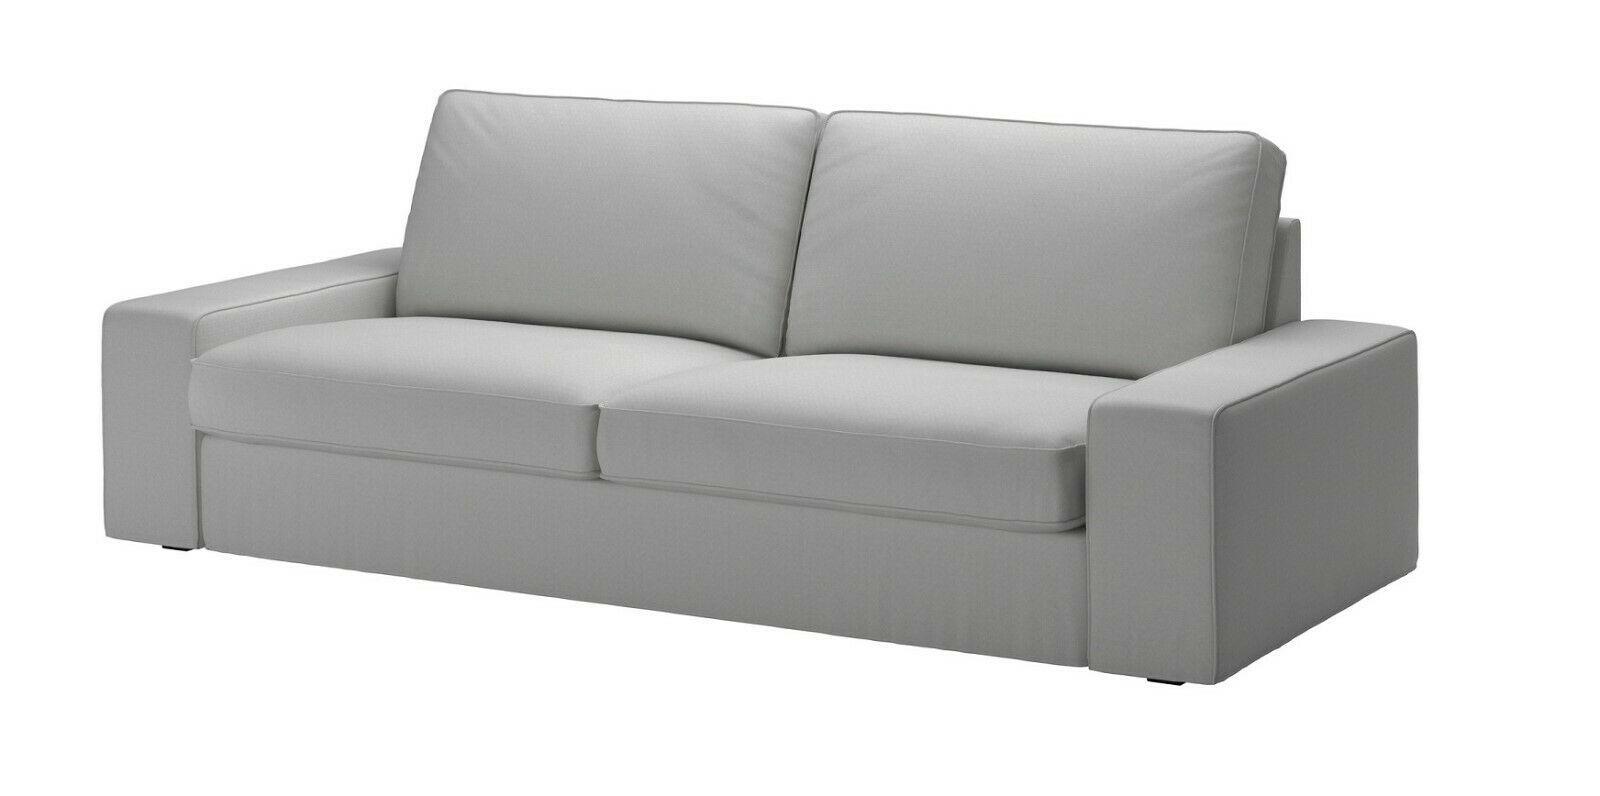 Groovy Ikea Kivik Loveseat Cover Orrsta Gray Kivik 2 Seat Sofa Evergreenethics Interior Chair Design Evergreenethicsorg